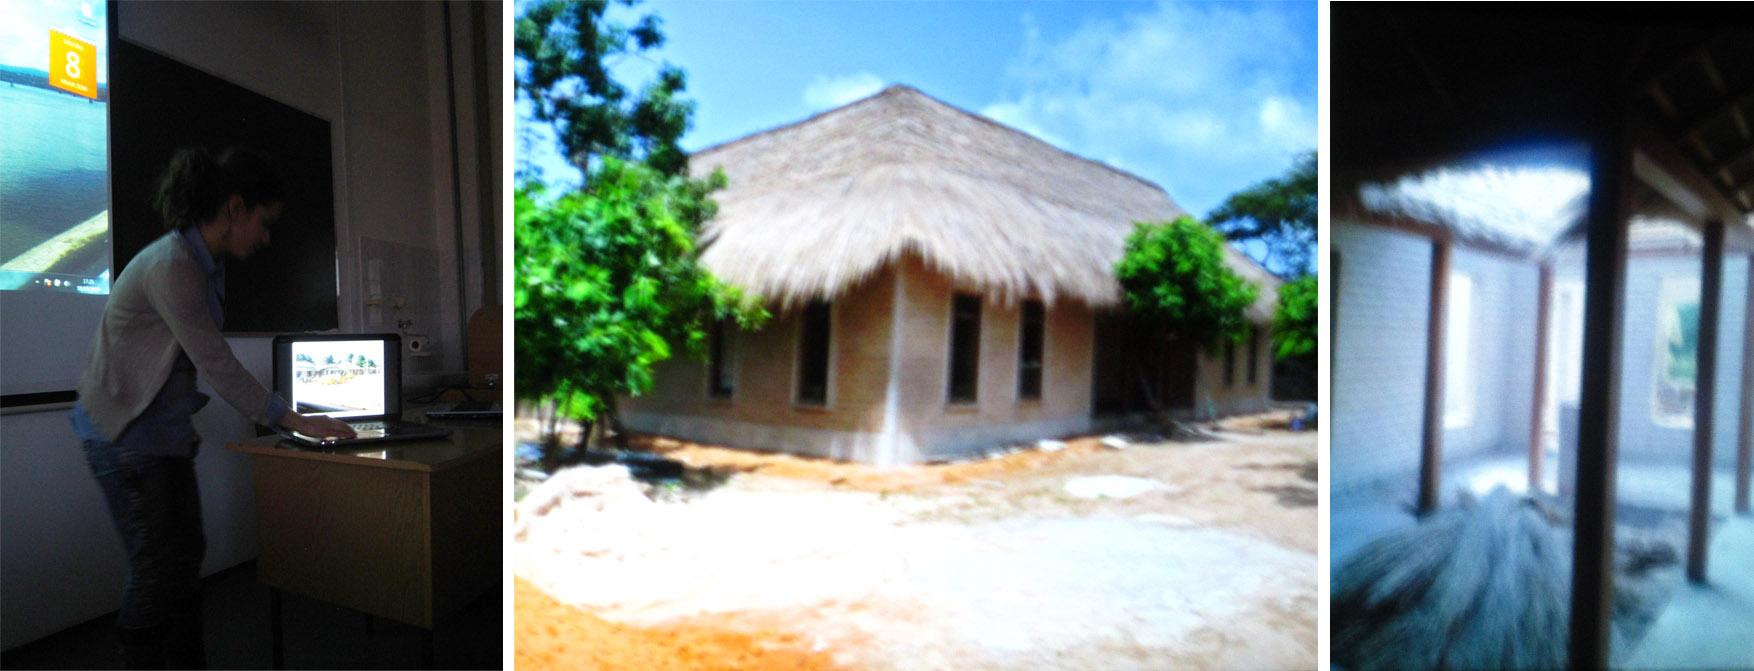 07 ubrzani kurs zemljane arhitekture NatalijaStankovic i kuca u Gambiji